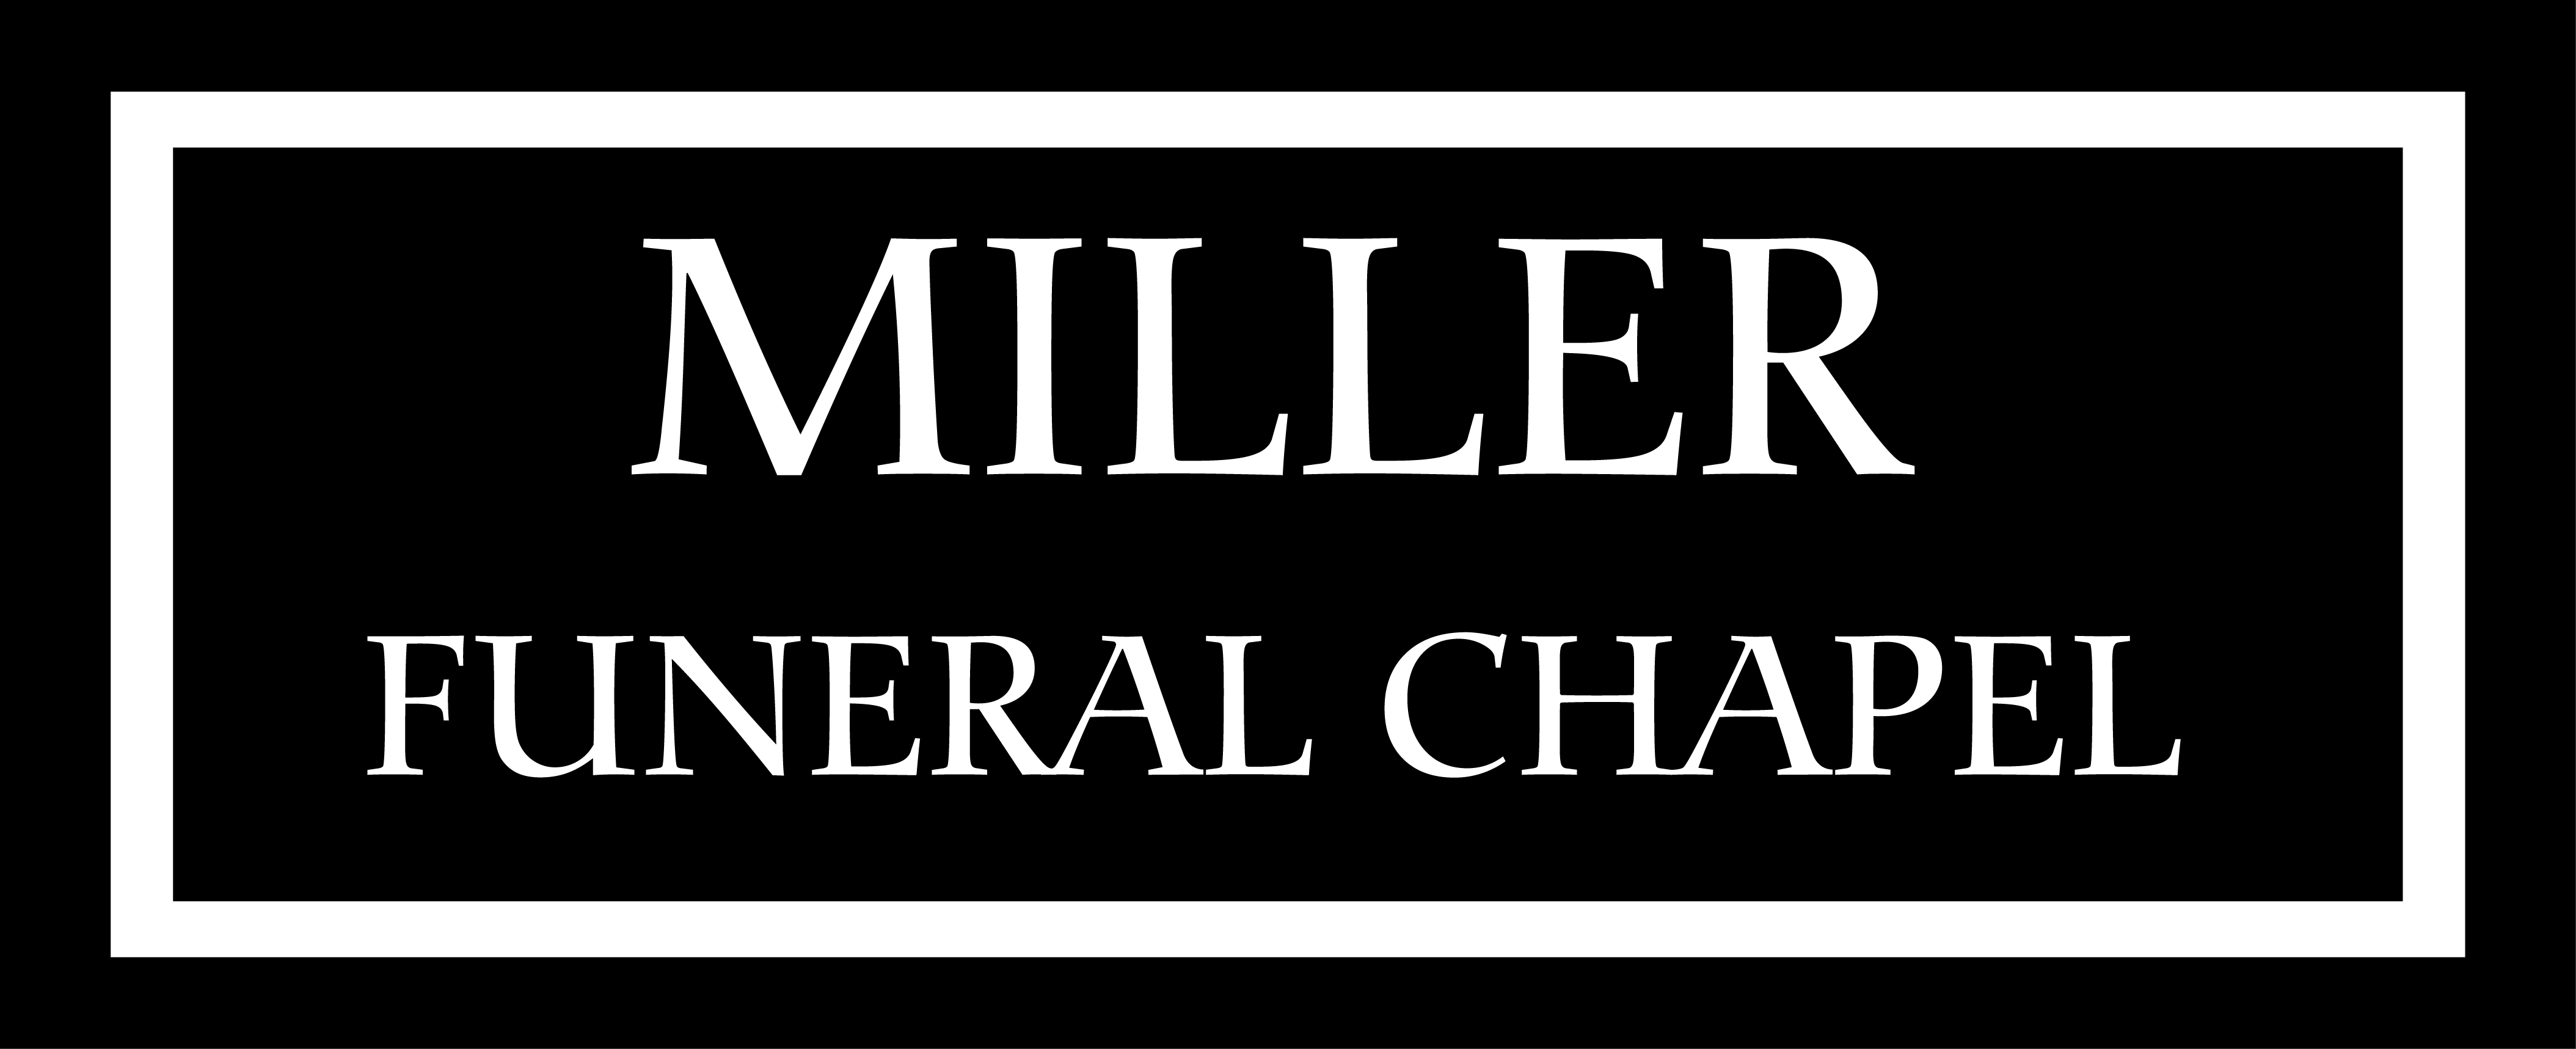 Miller Funeral Chapel Ltd.